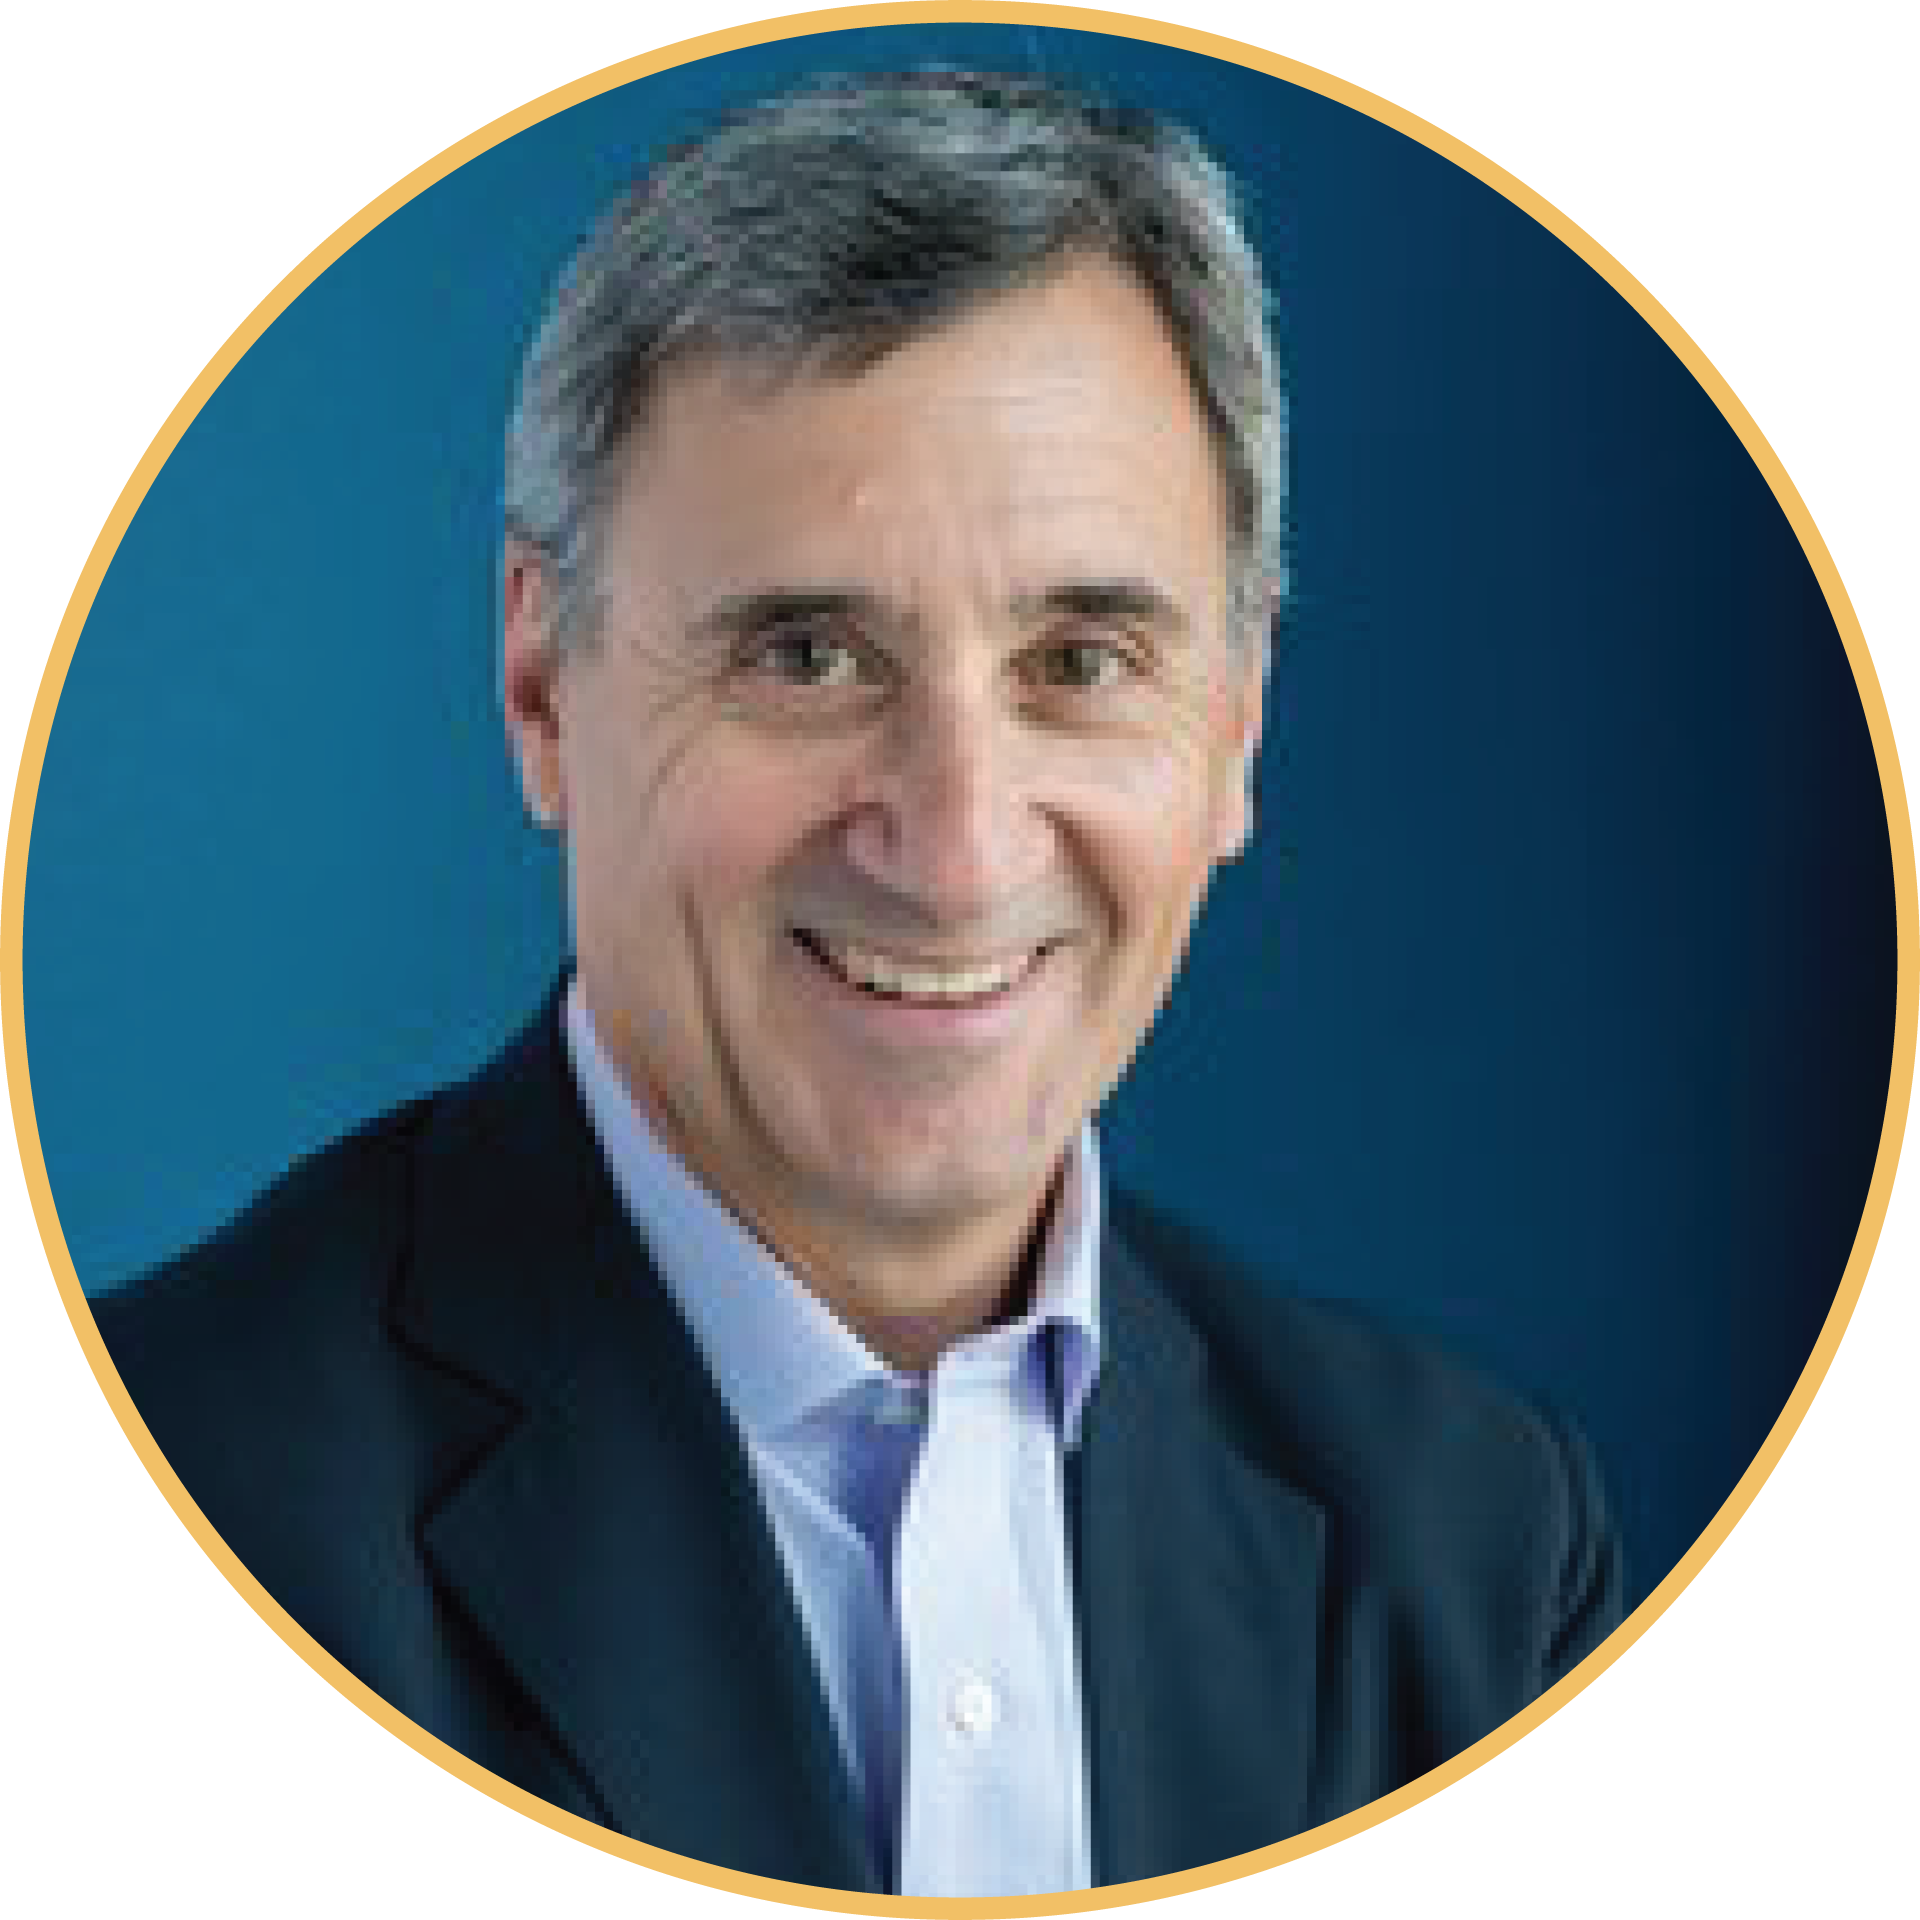 Ken Goldstein - Certified Professional Behavioural Analyst (C.P. B. A.) DISC - People Management SpecialistEmail | LinkedIn